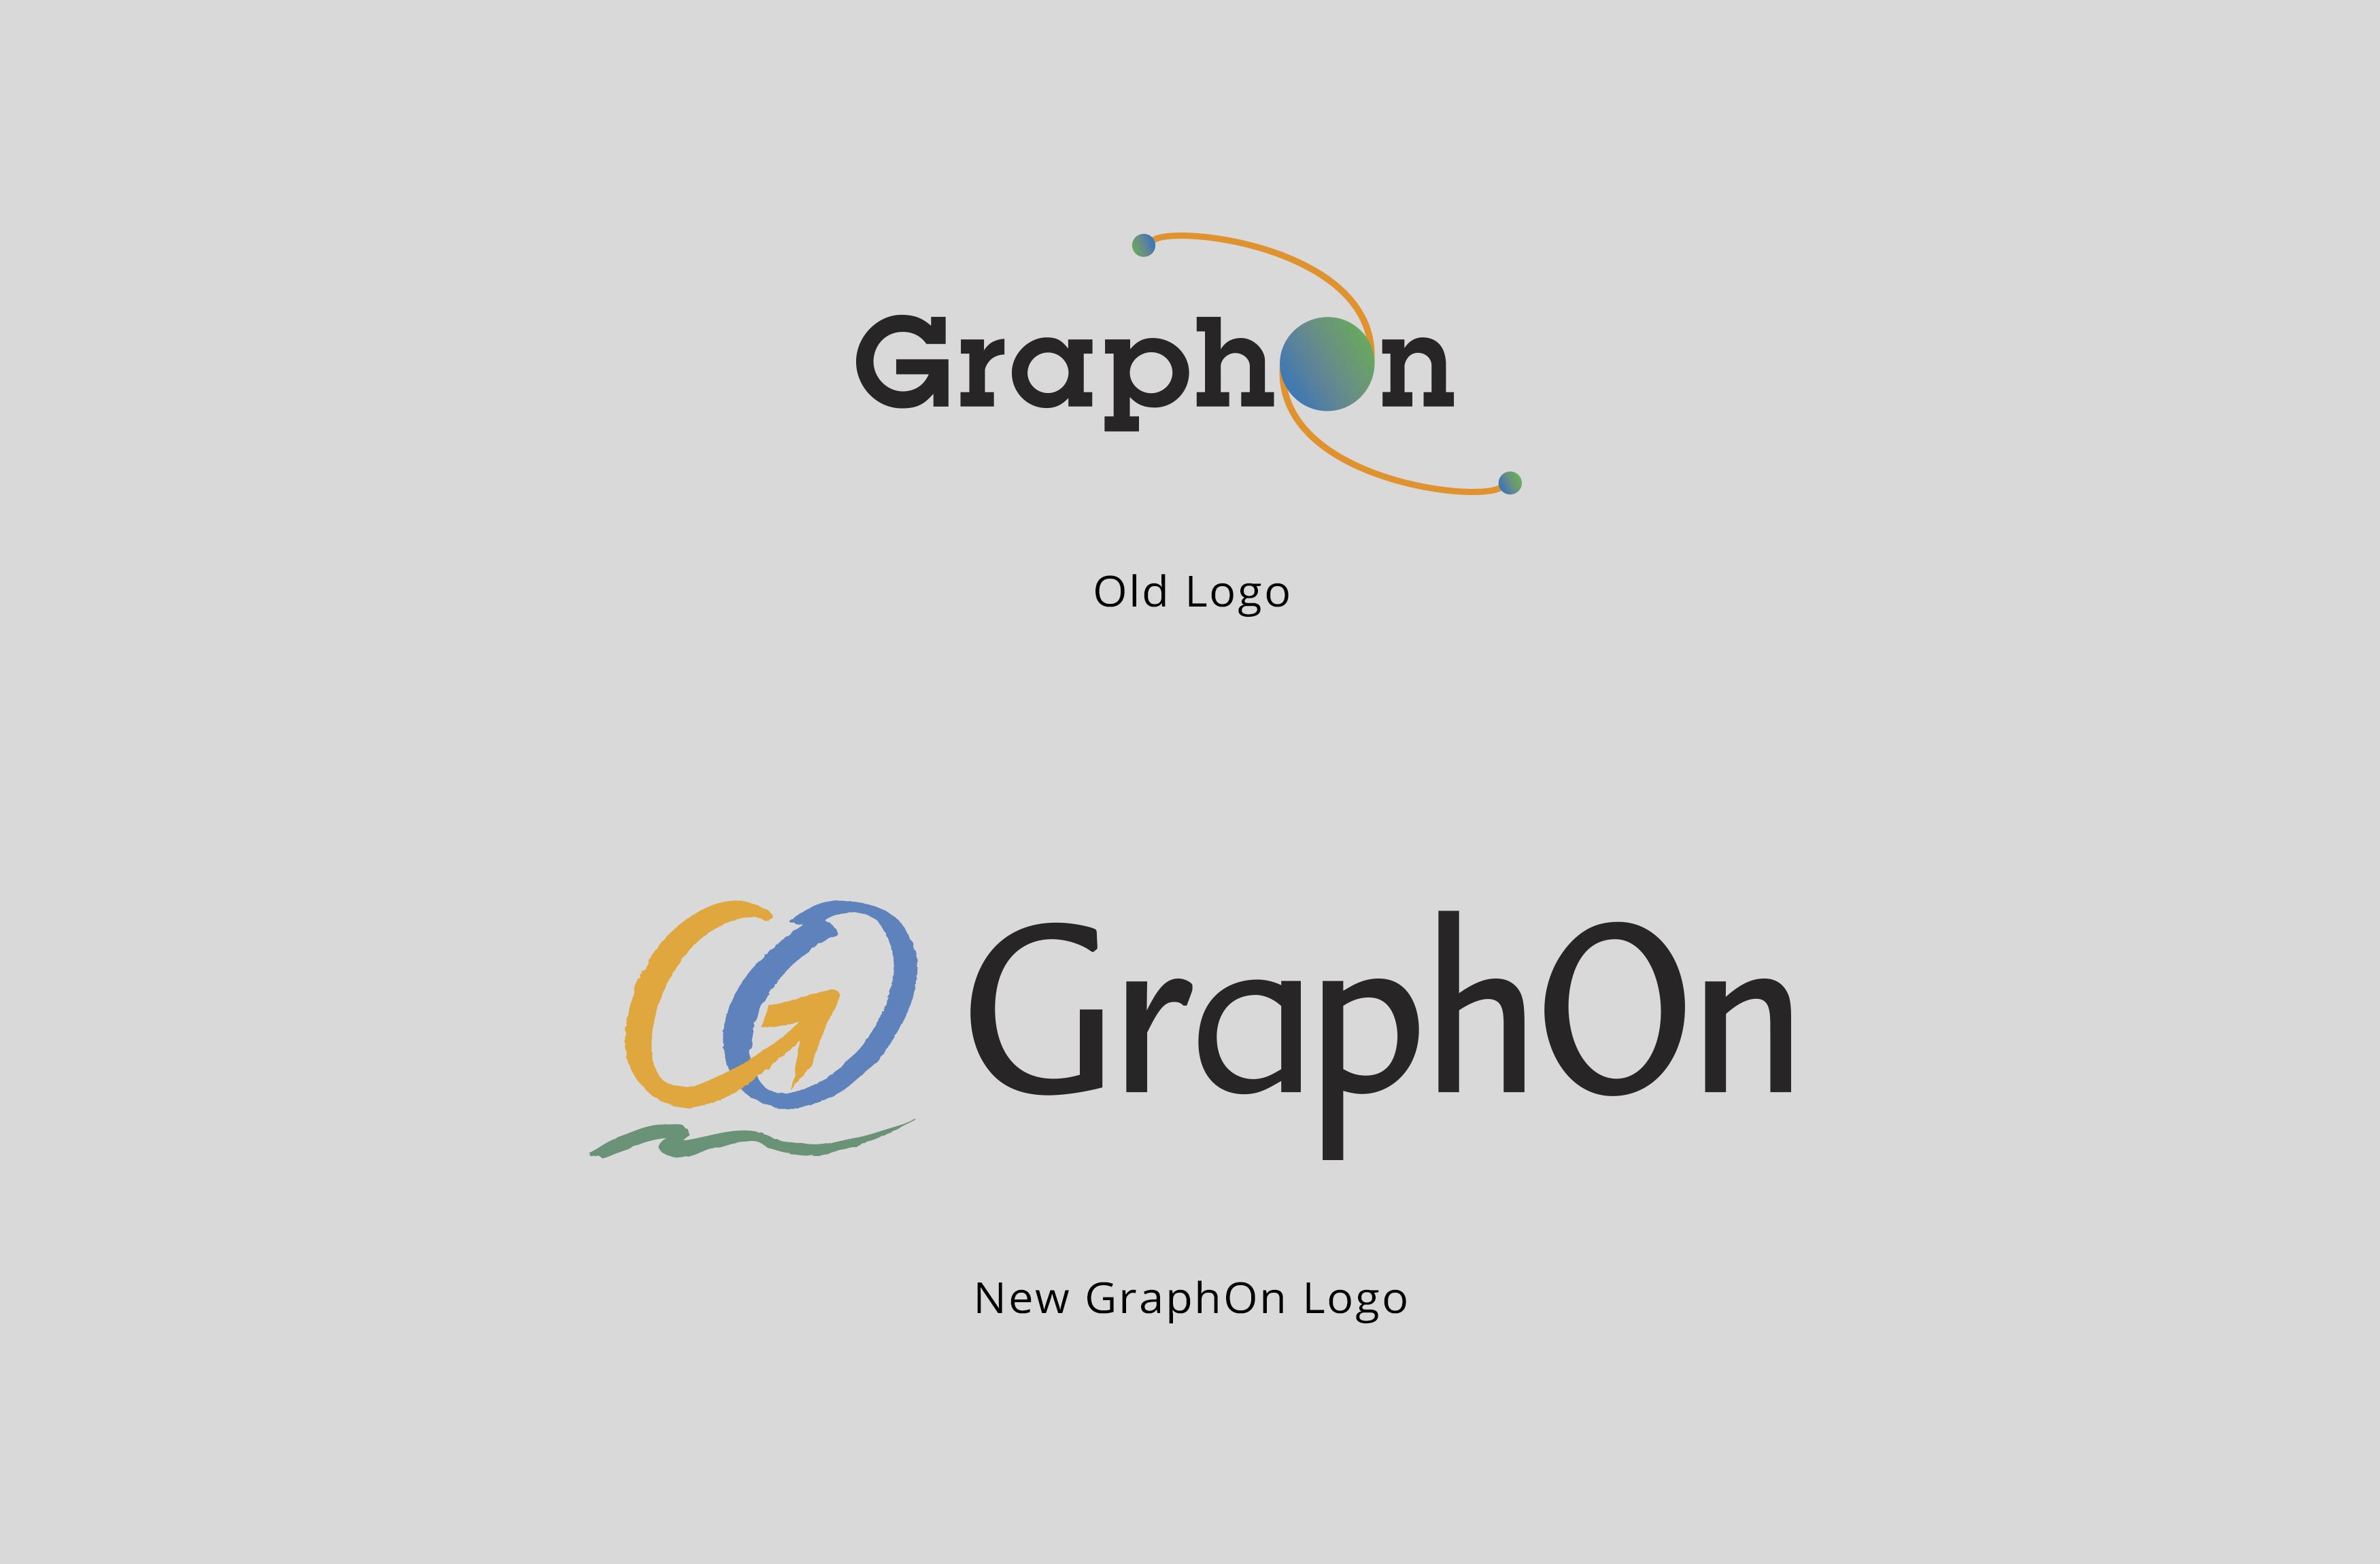 Brand Identity | GraphOn Logo Old vs. New